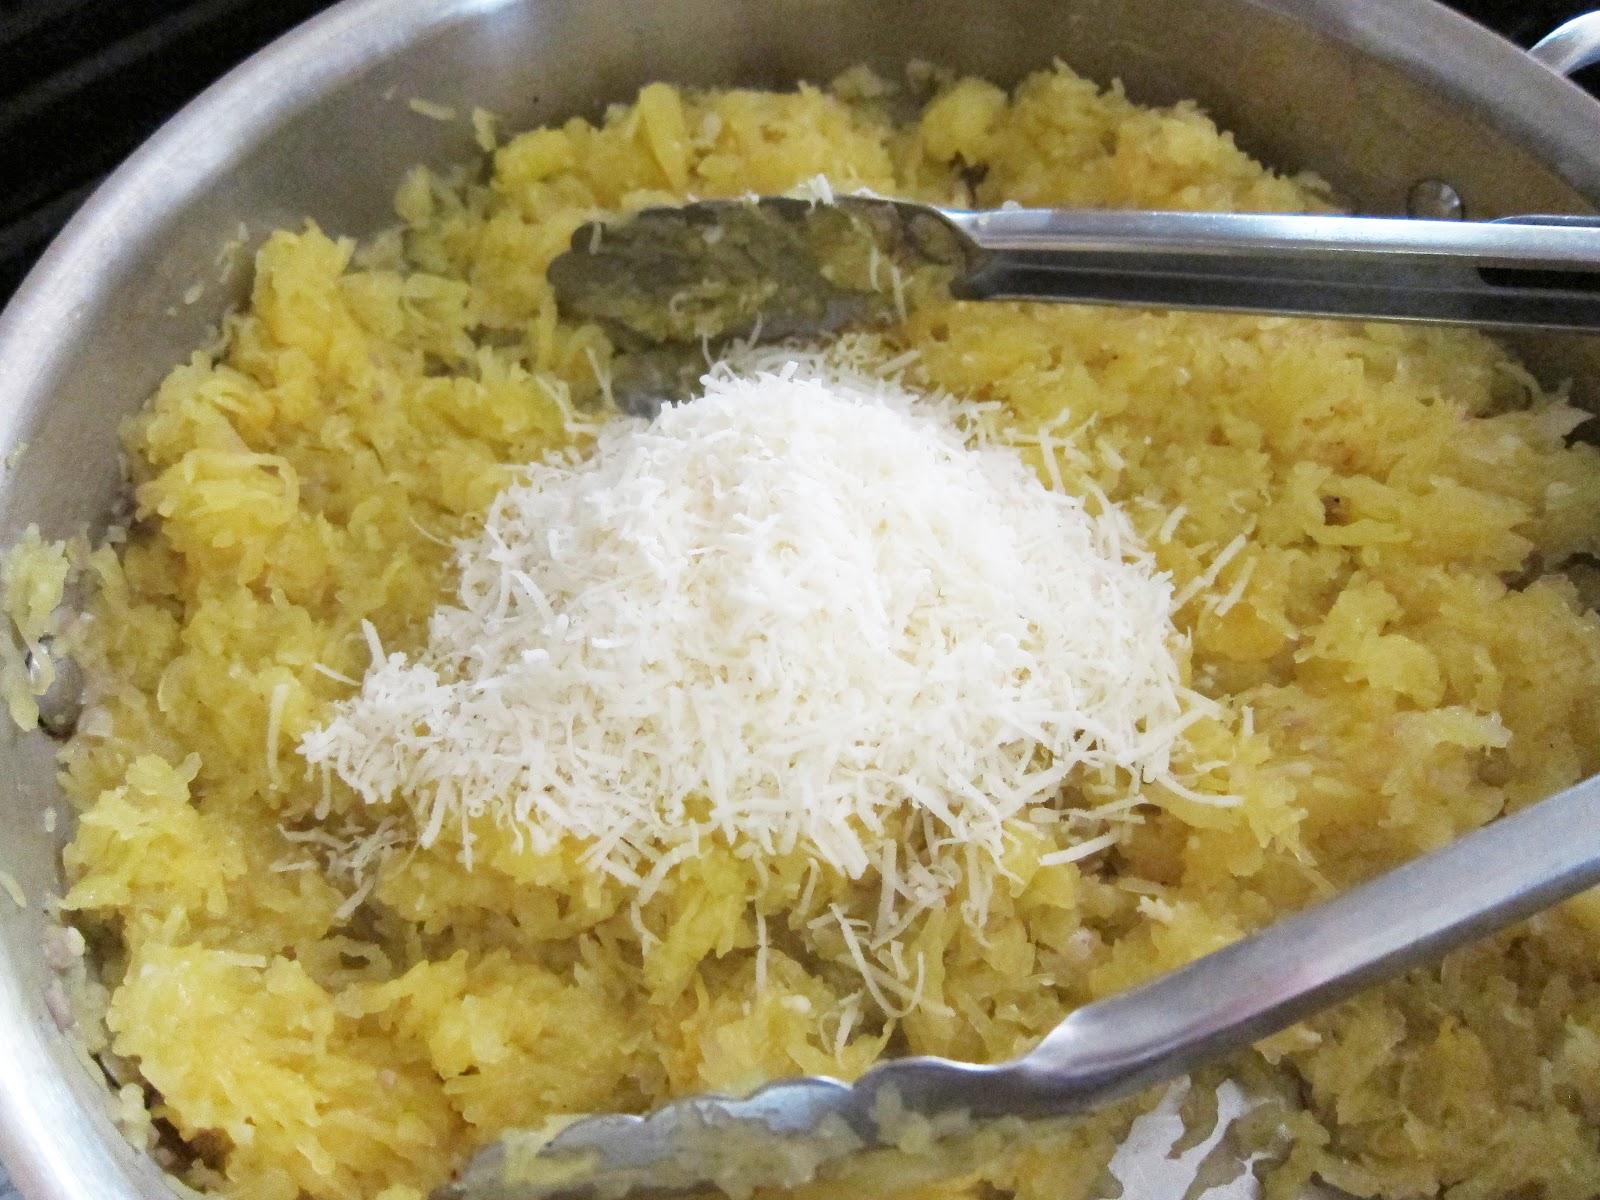 Bloatal Recall: Roasted Spaghetti Squash with Parmigiano-Reggiano